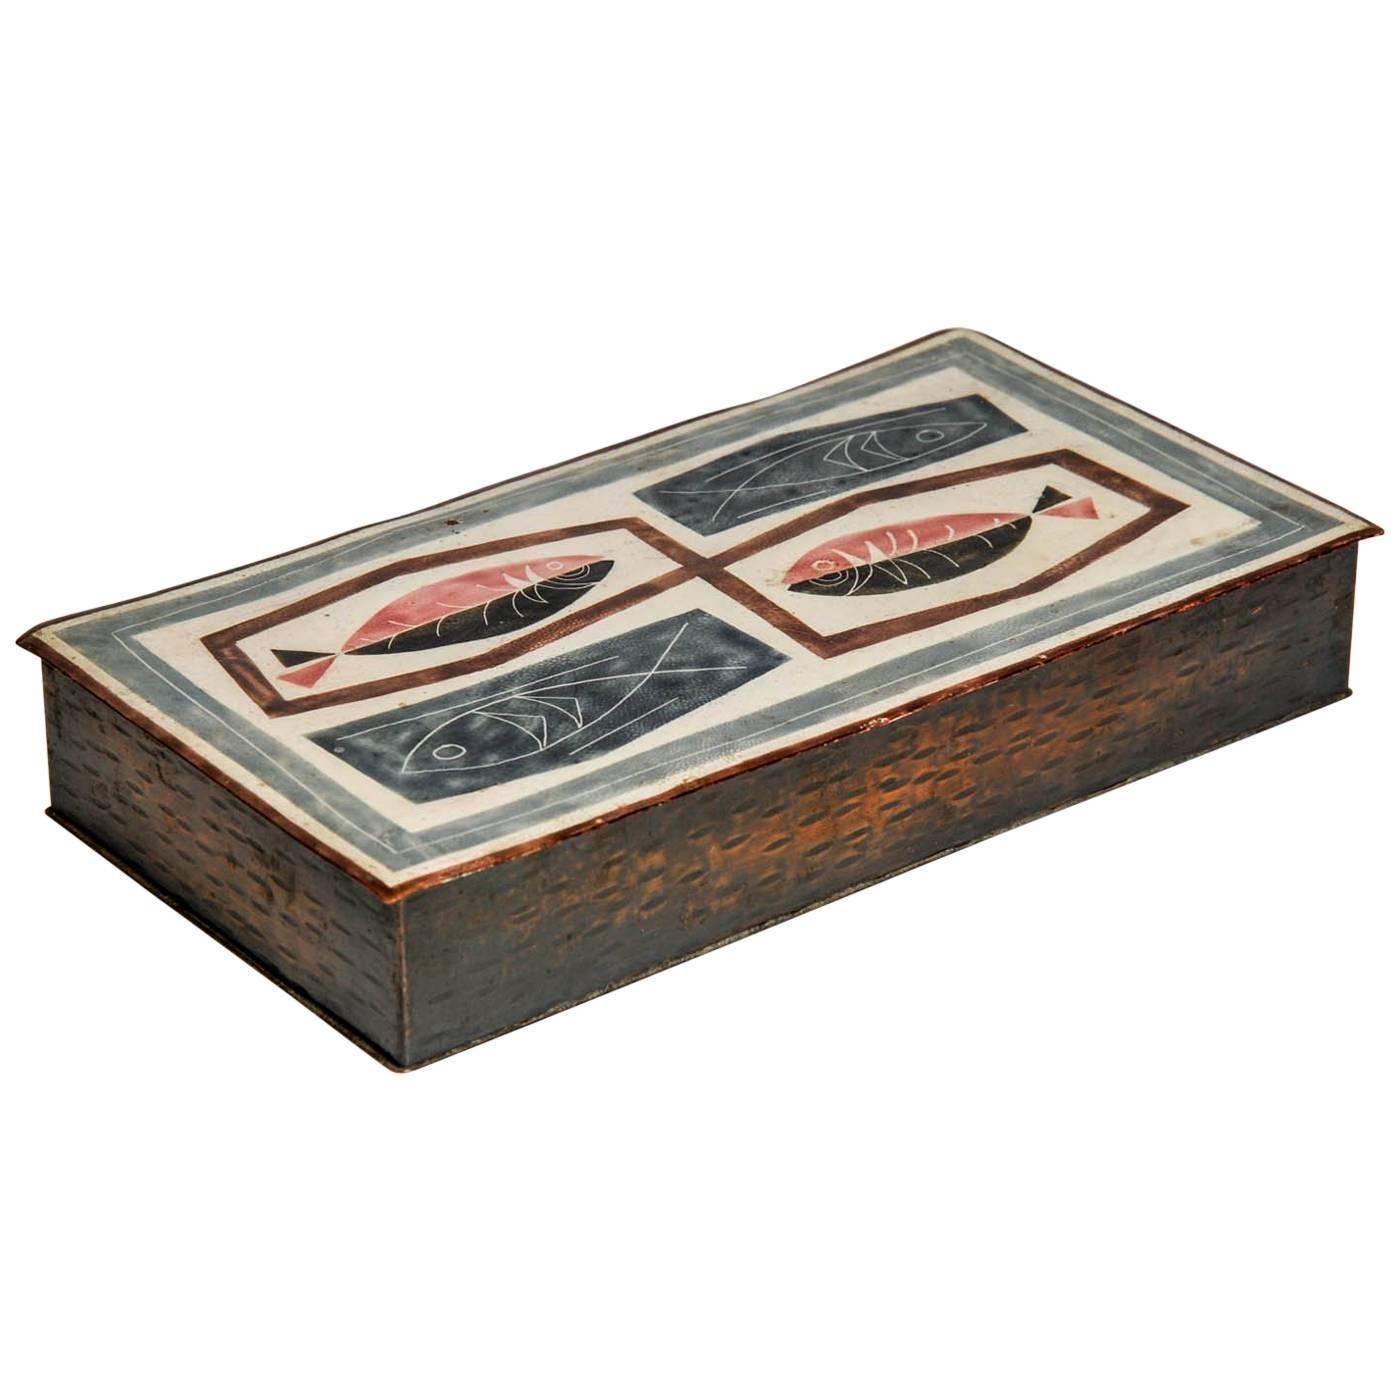 1960s Enameled Box with Trade Mark